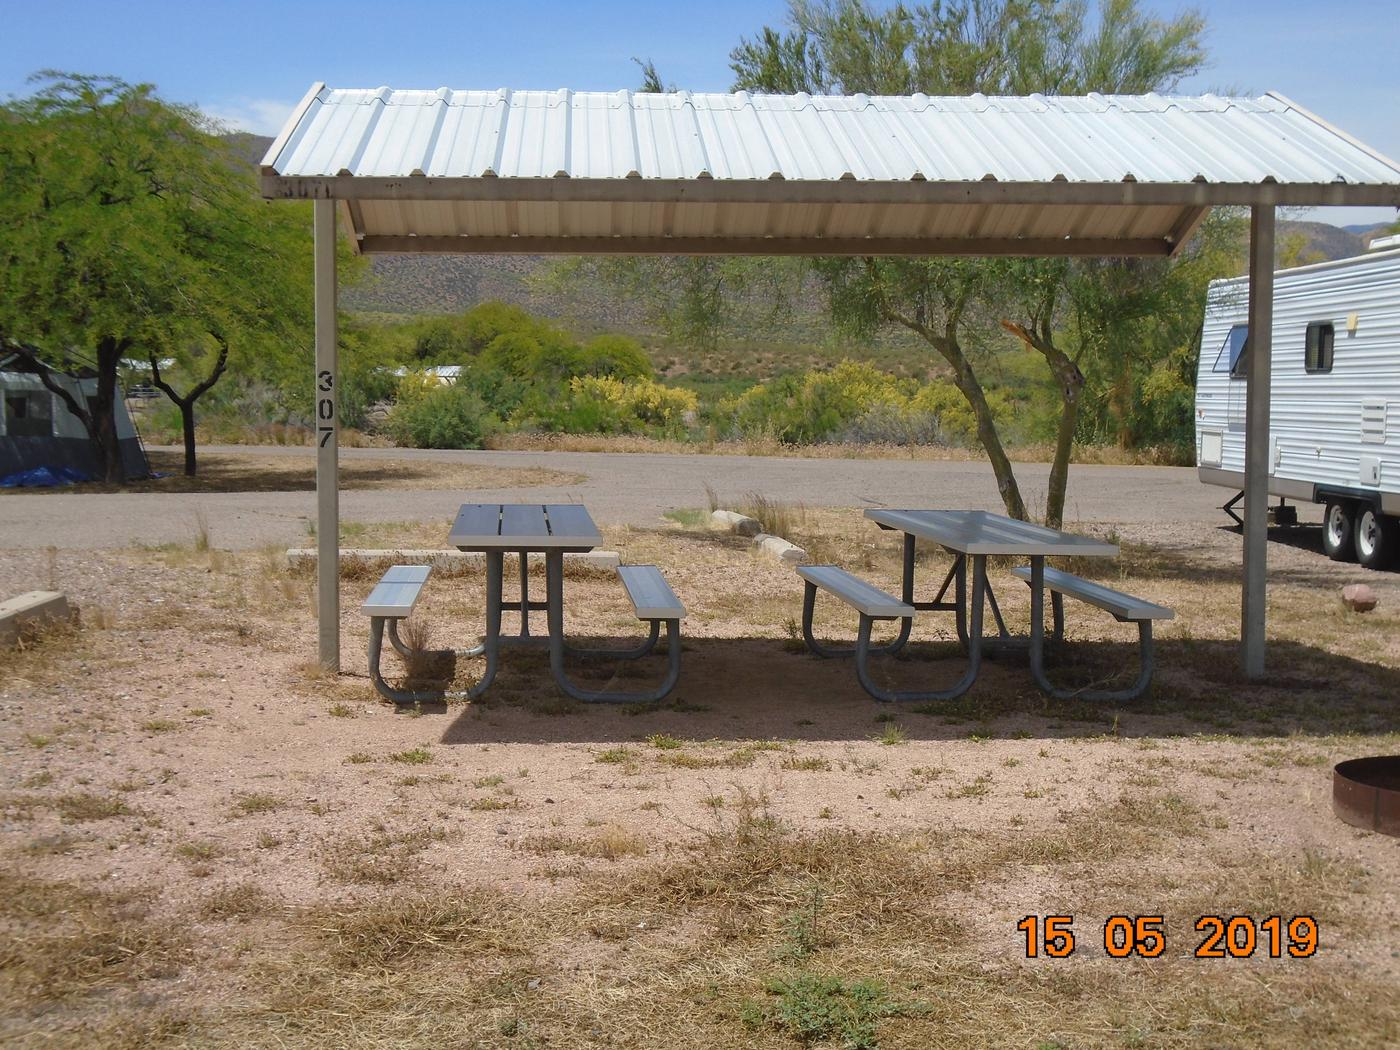 Campsite 307Windy Hill Campground